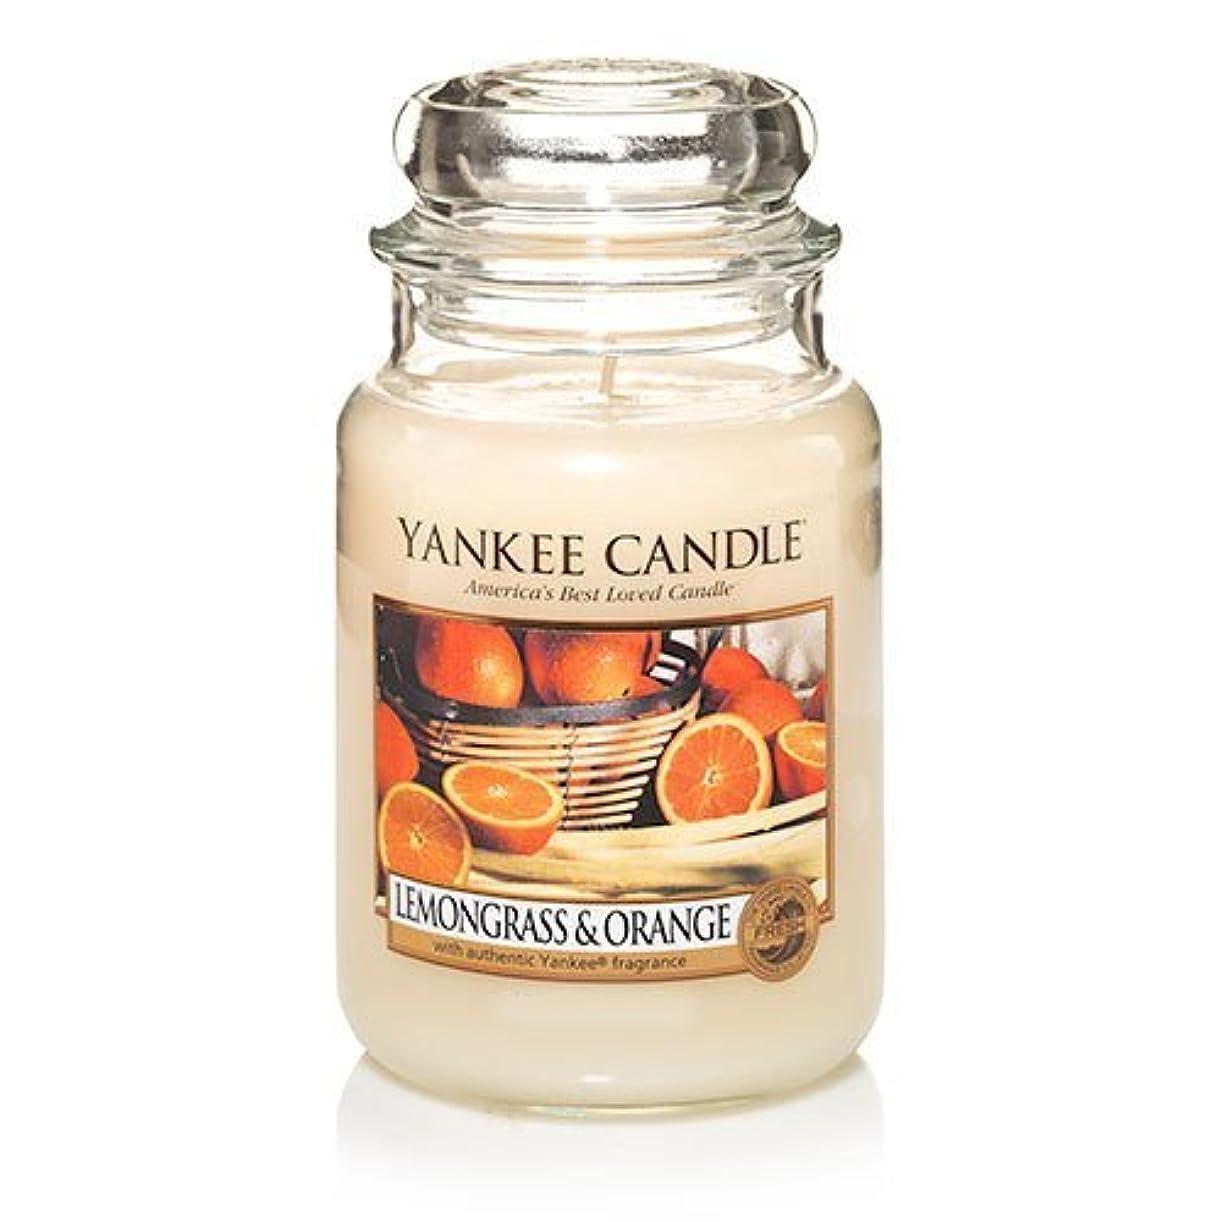 Yankee Candle Lemongrass & Orange - 22oz Large Housewarmer Jar by Yankee Candle [並行輸入品]